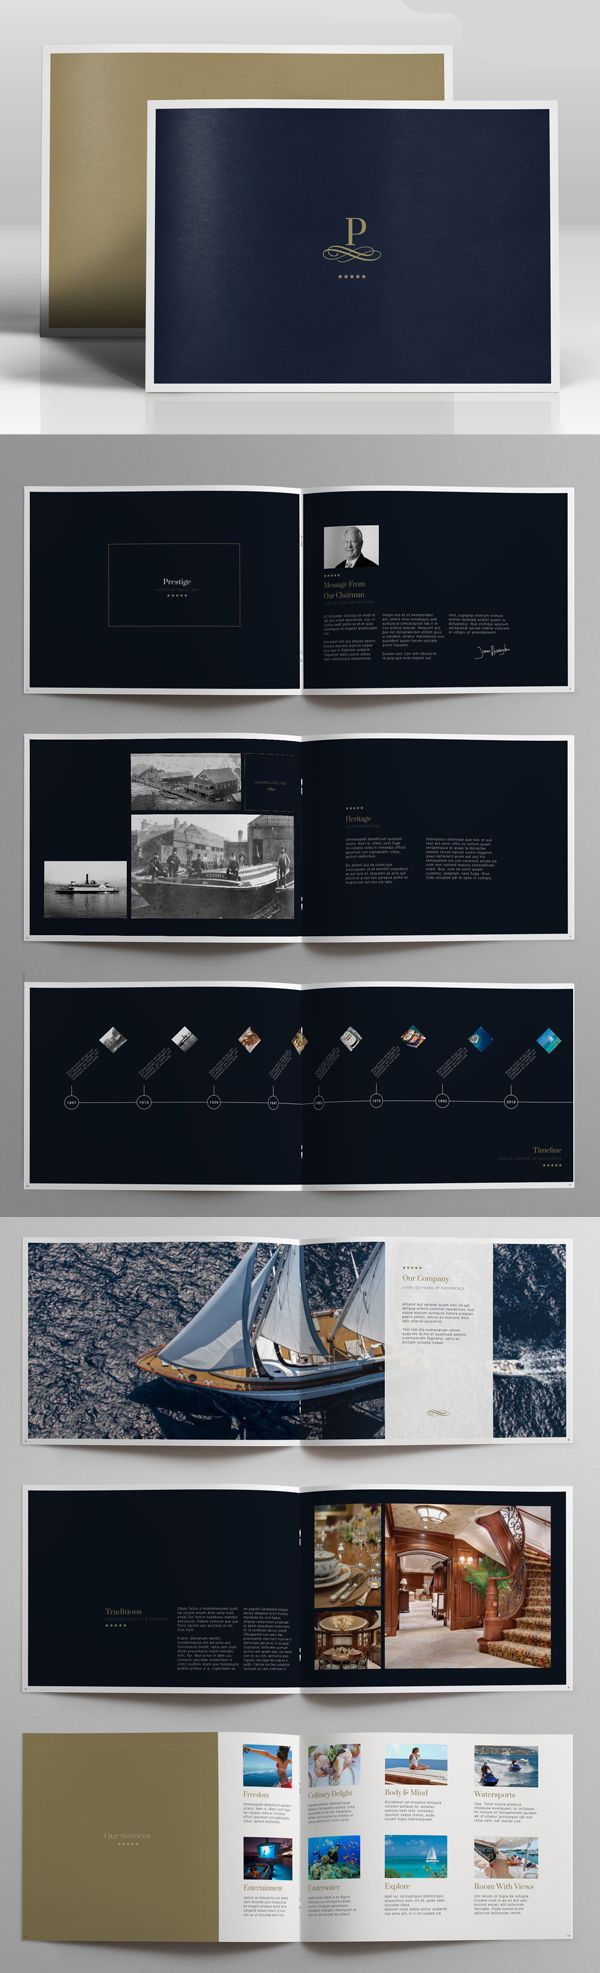 New Brochure Templates Catalog Design | Design | Graphic Design Junction